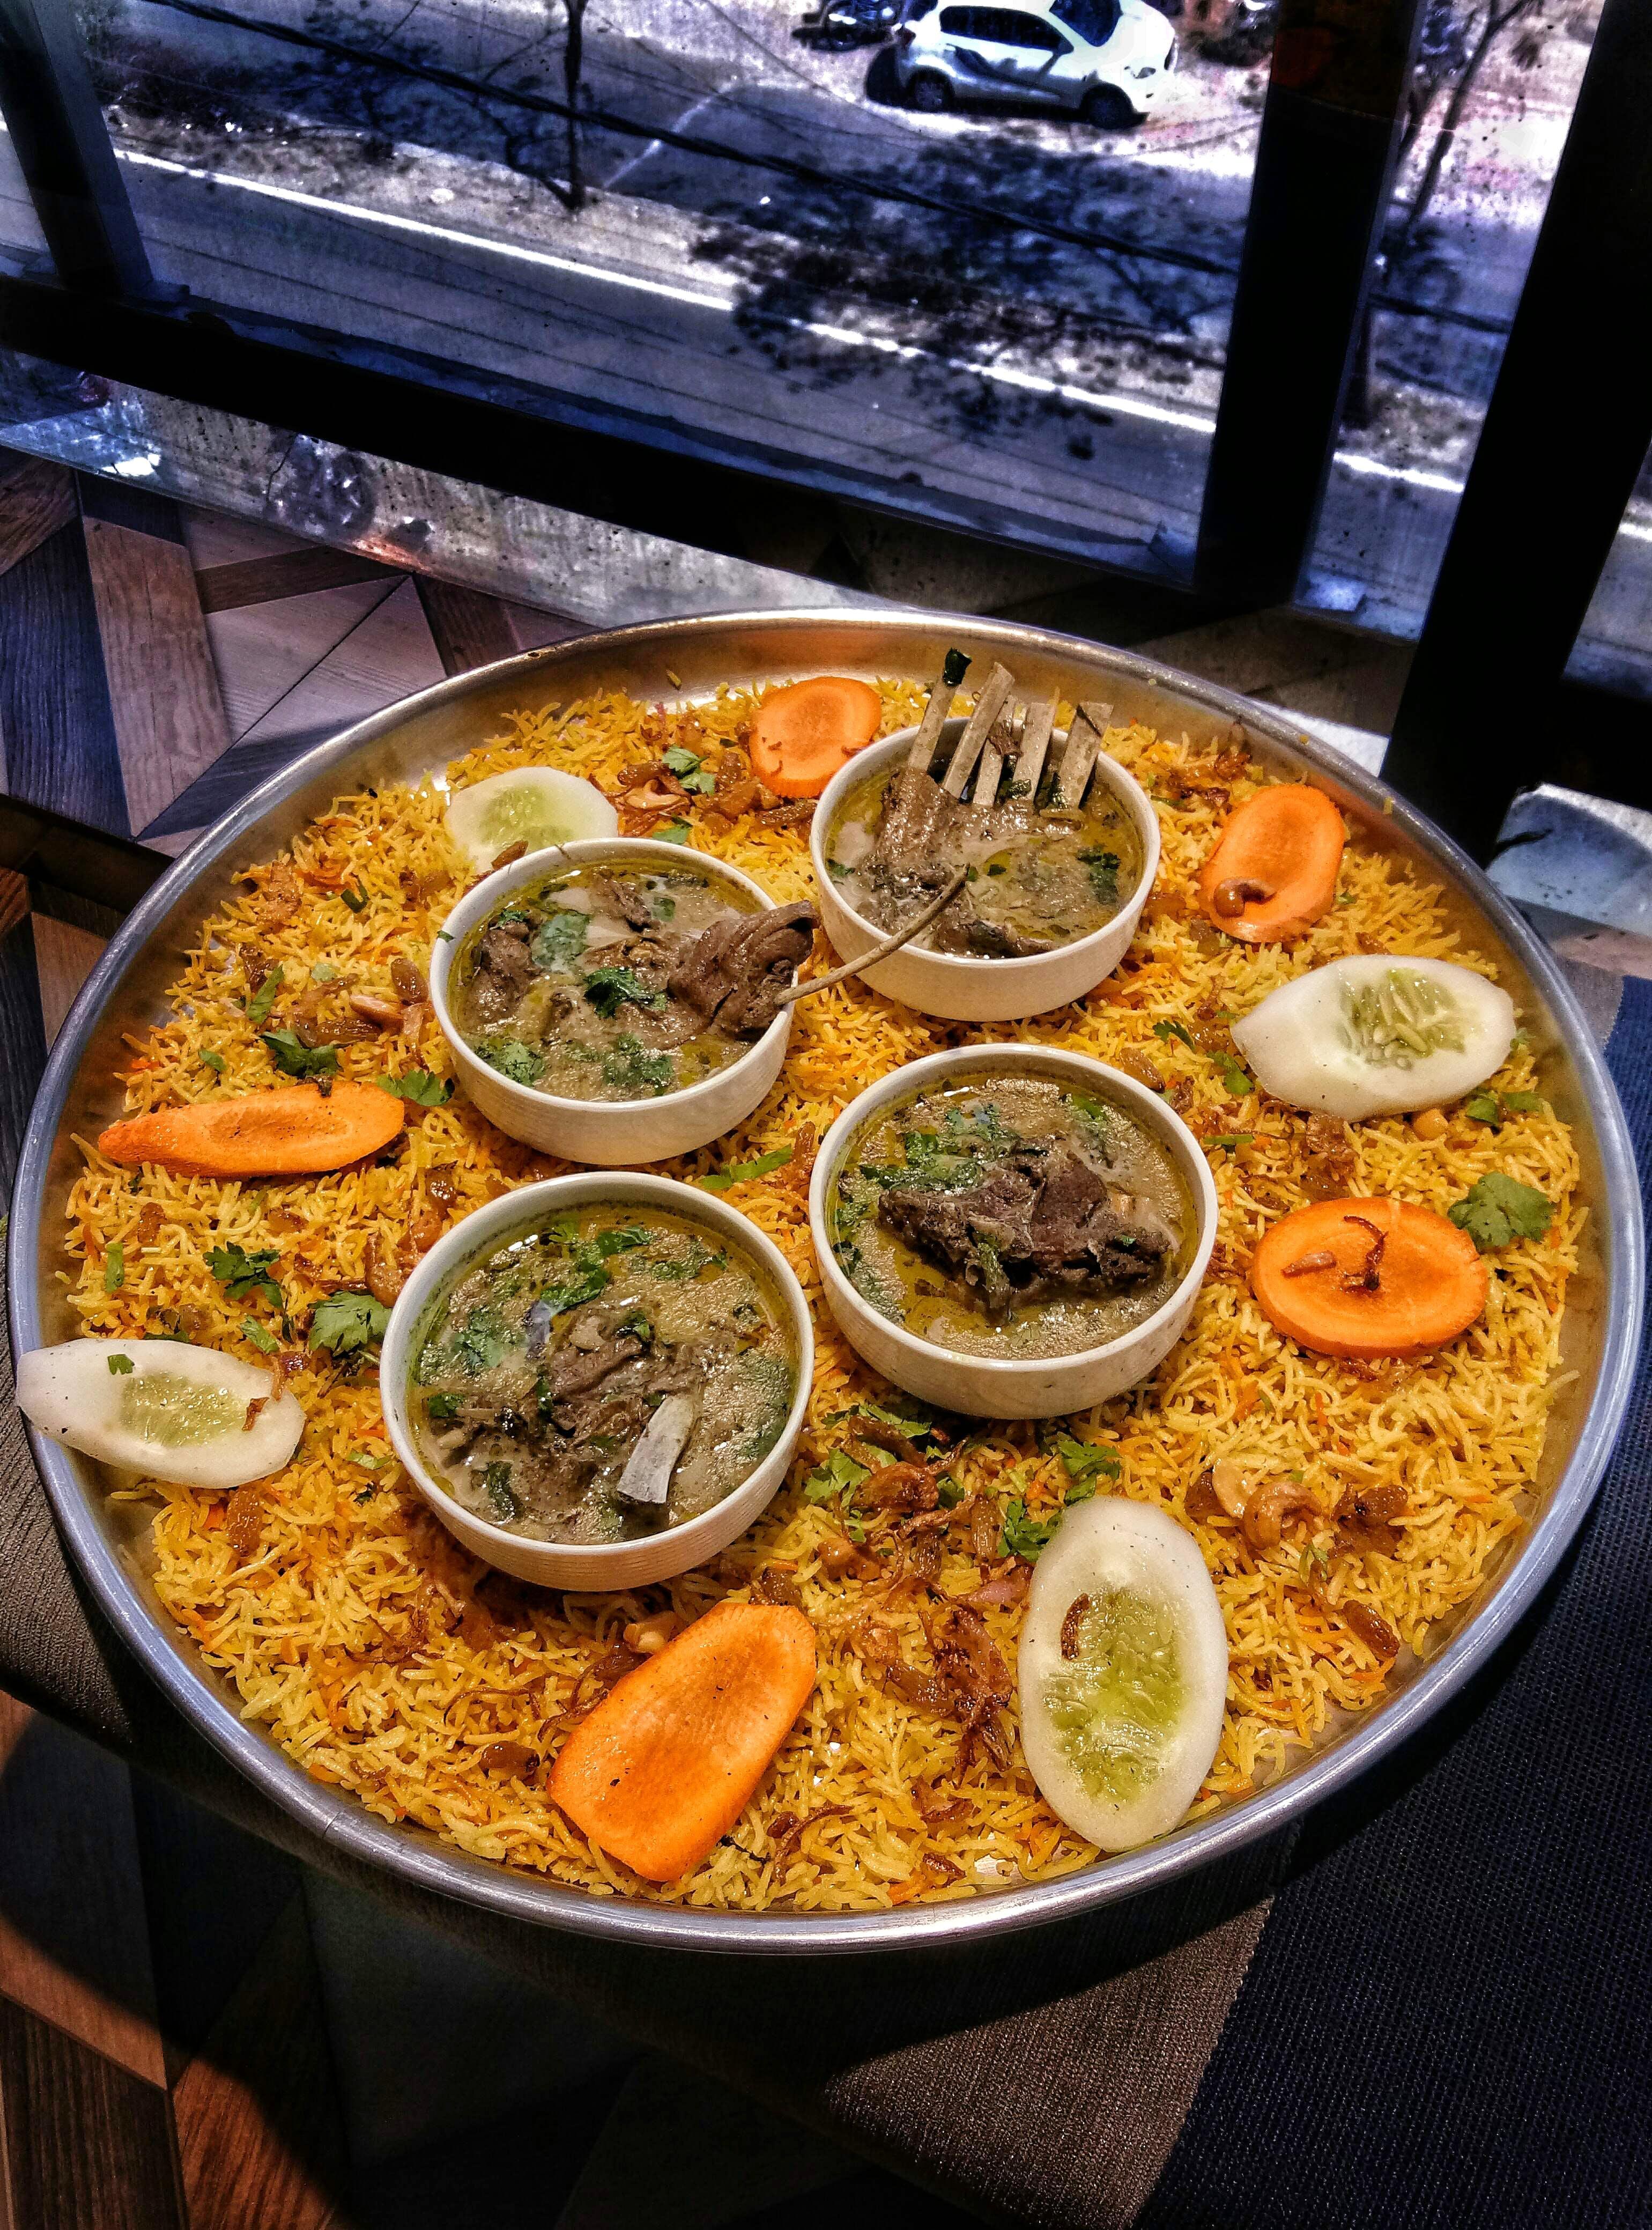 This Restaurant Has Literally Established Itself In The Dlf Food Hub Of Gachibowli